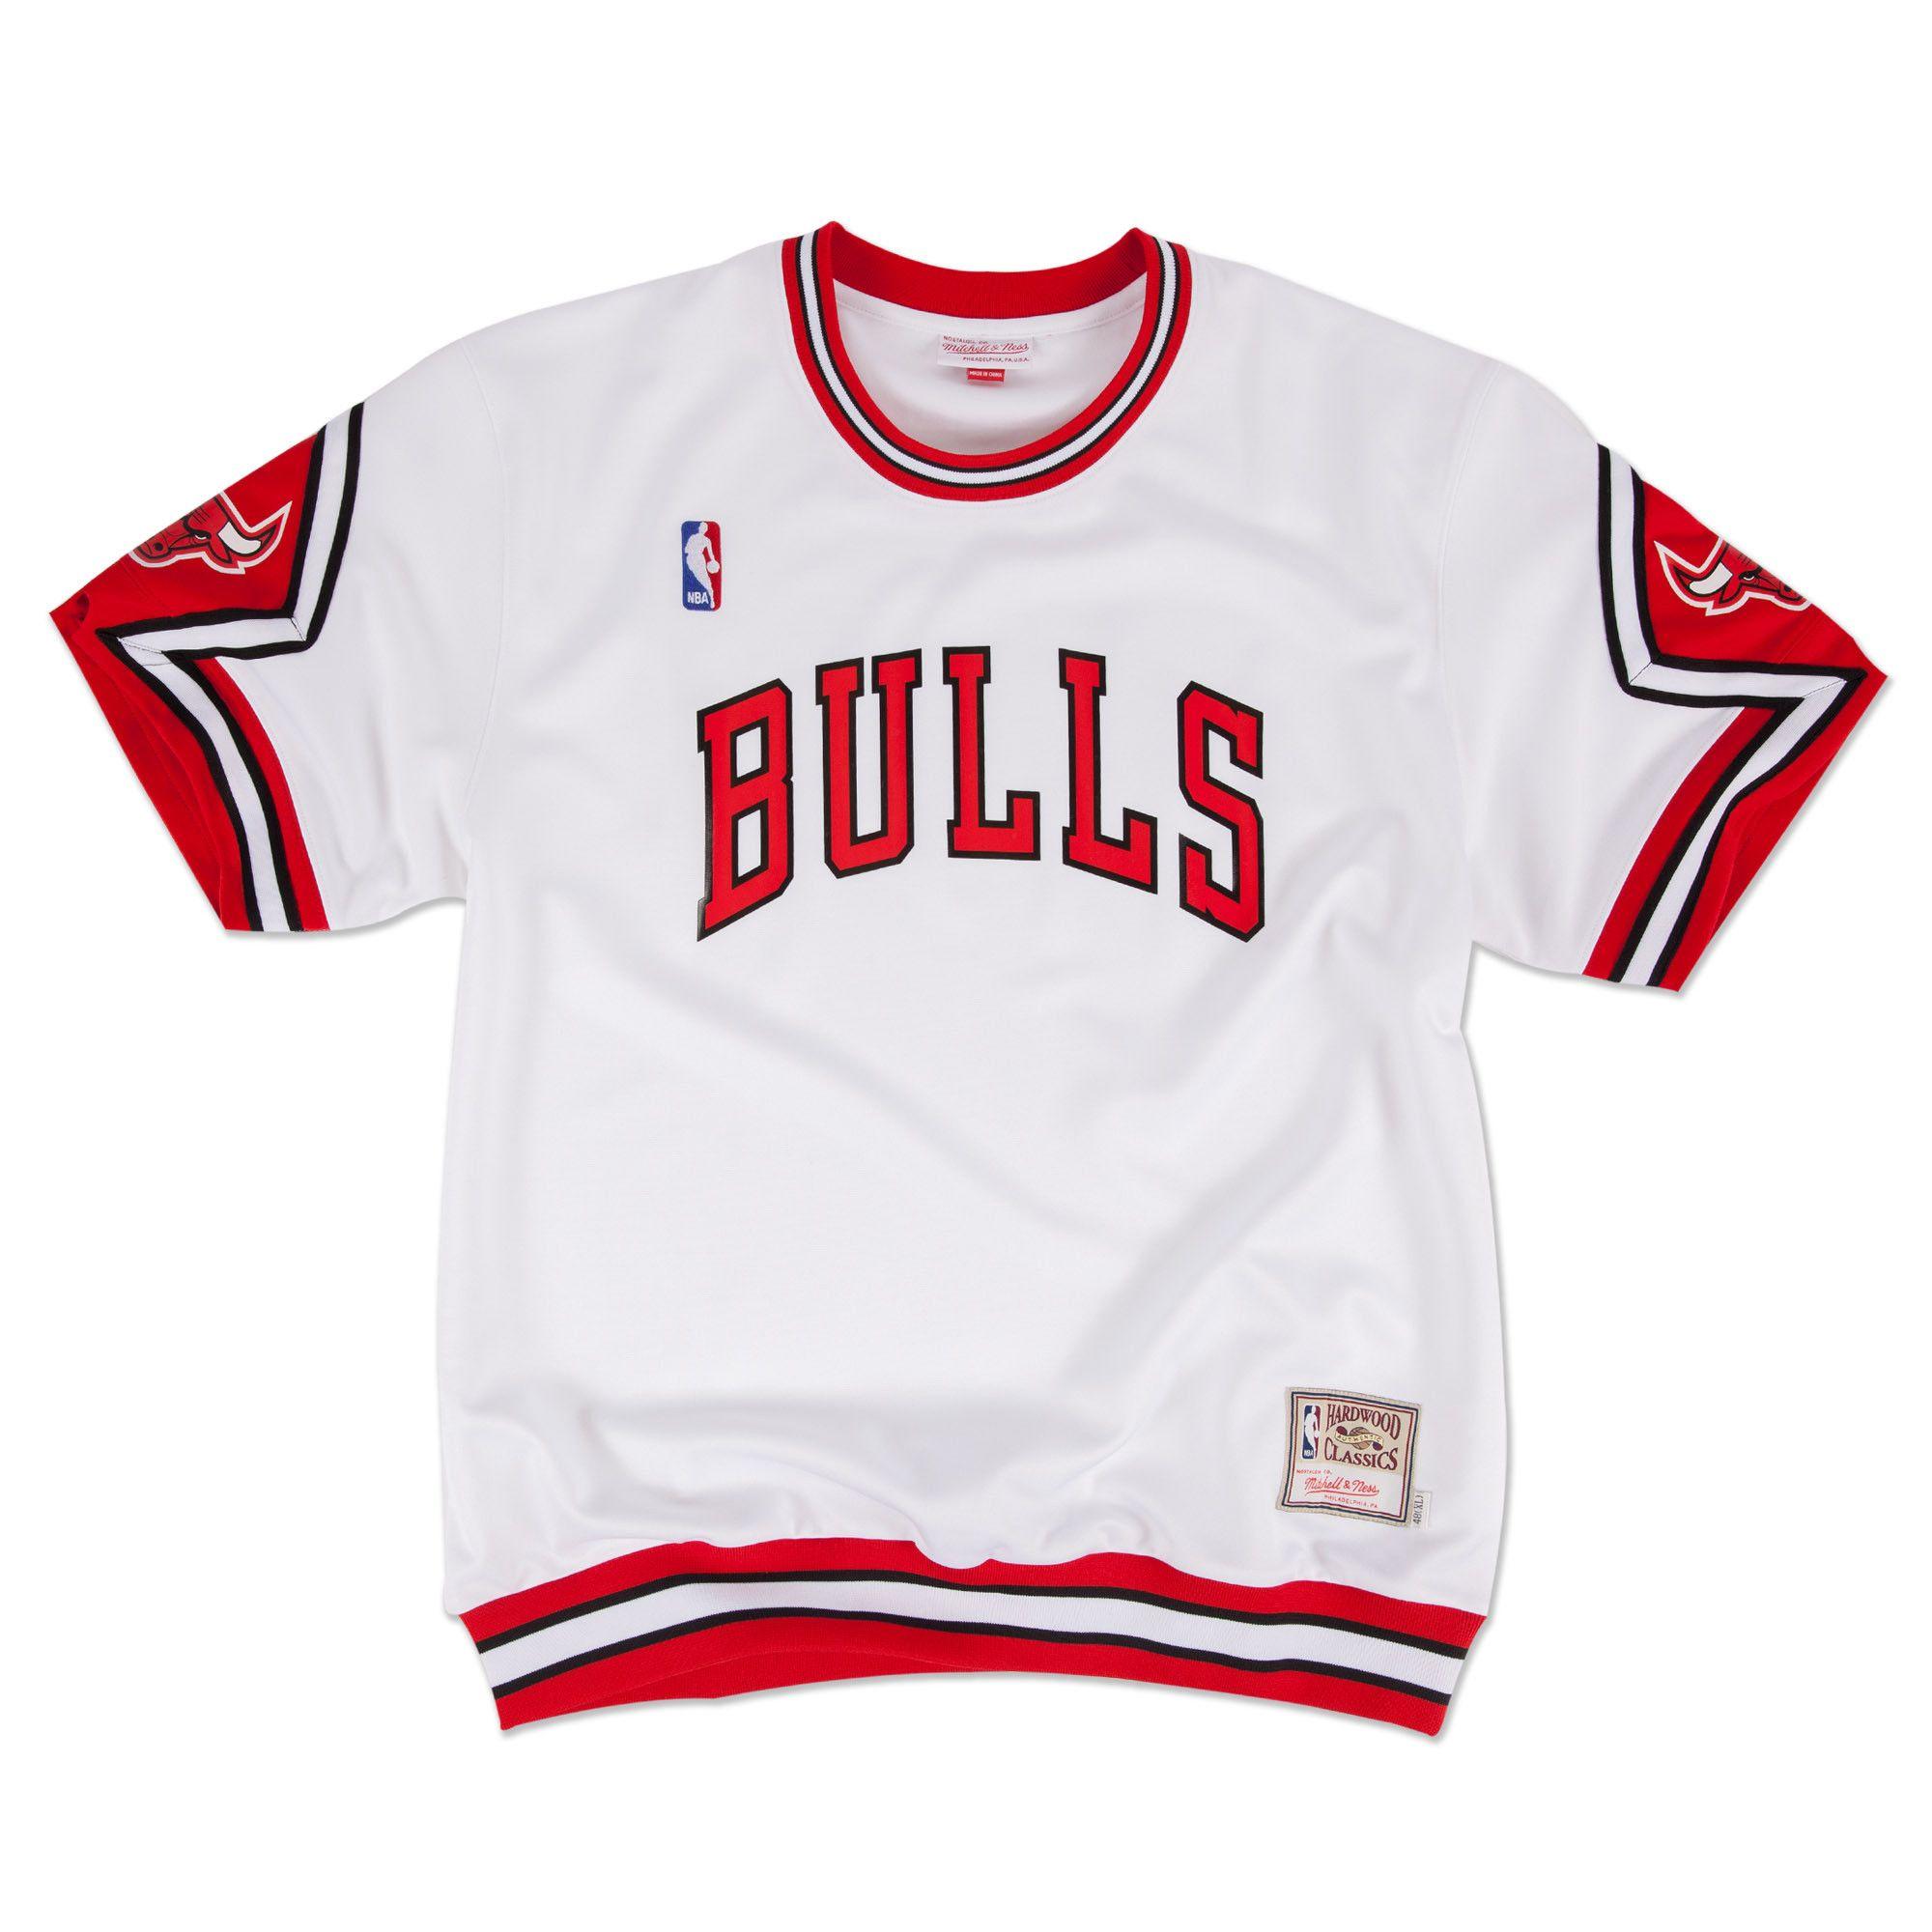 5dab58fed 1987-88 Authentic Shooting Shirt Chicago Bulls Mitchell   Ness Nostalgia Co.